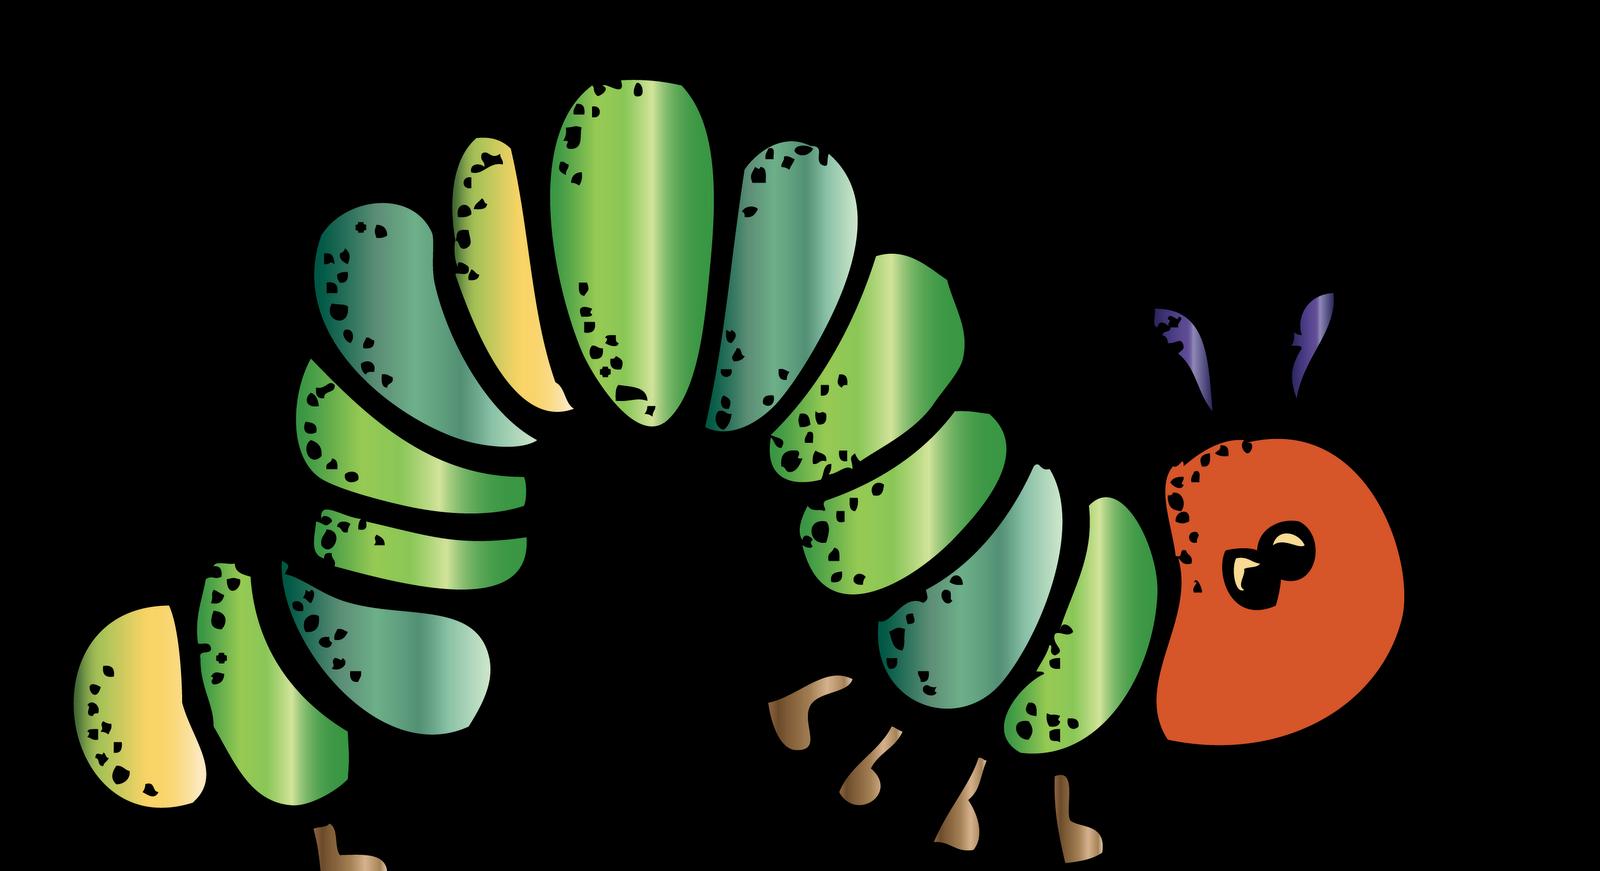 Caterpillar Clipart | Free download best Caterpillar Clipart on ... for Clipart Cute Caterpillar  545xkb